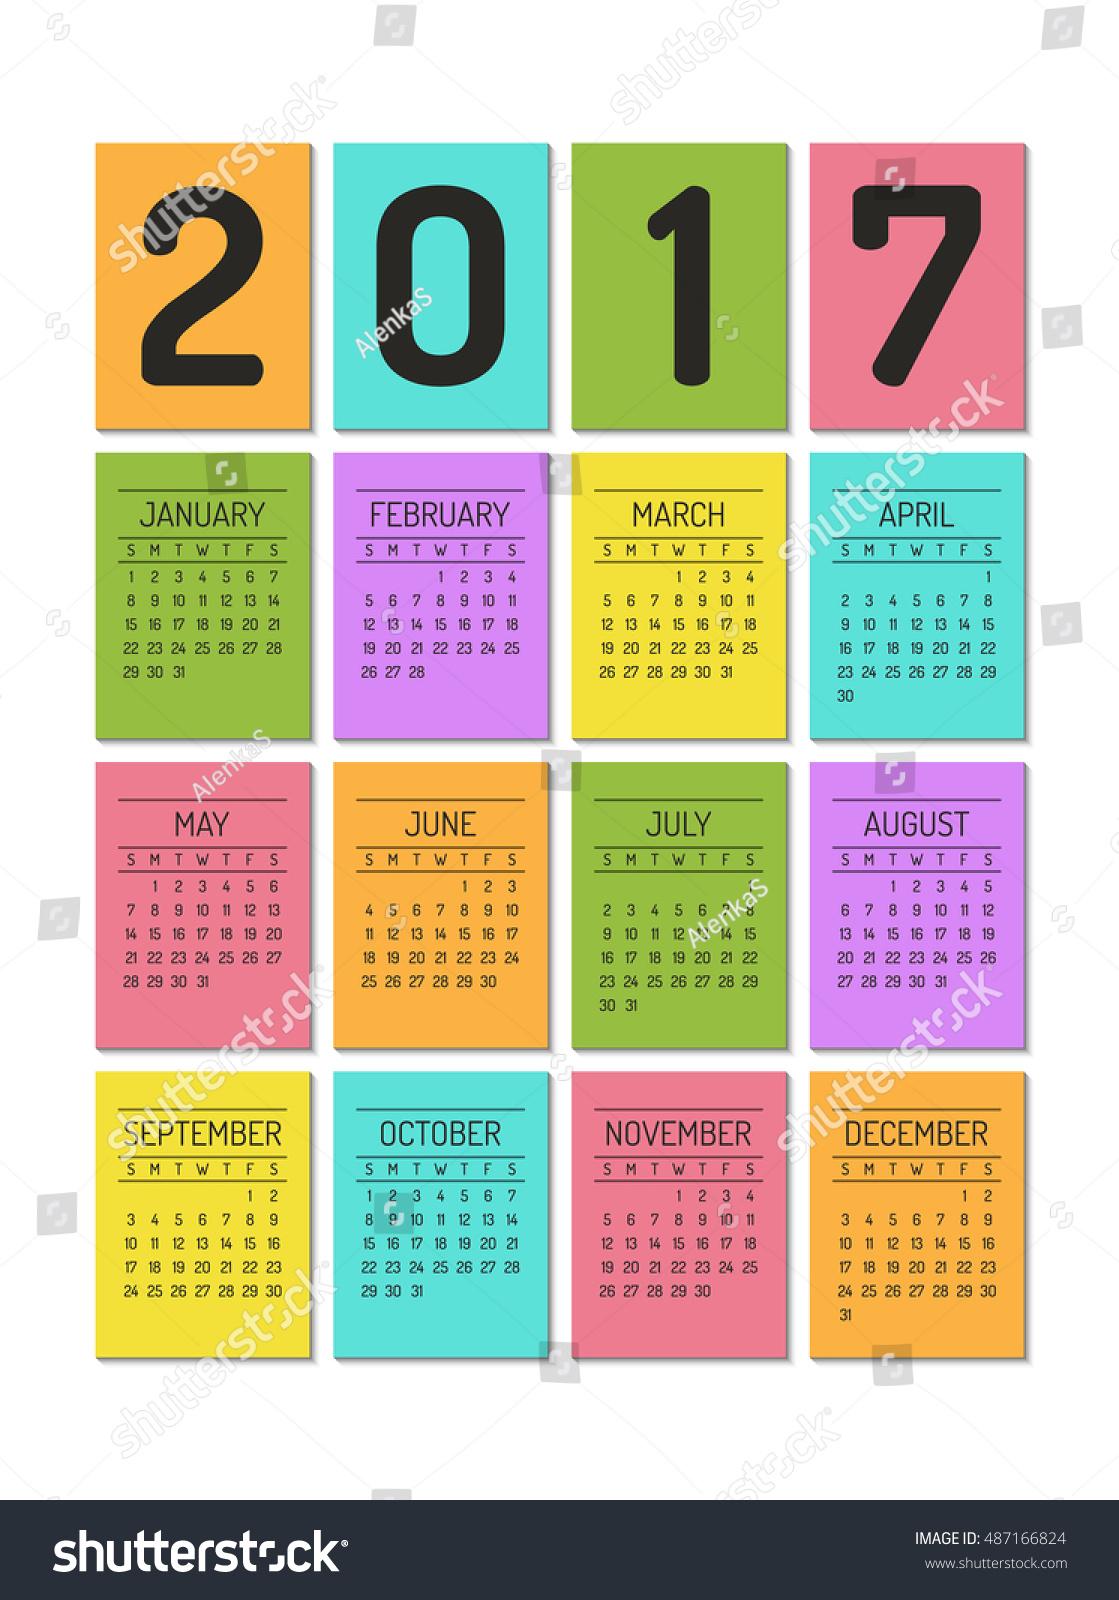 color block calendar template for 2017 year week starts on sundayvector